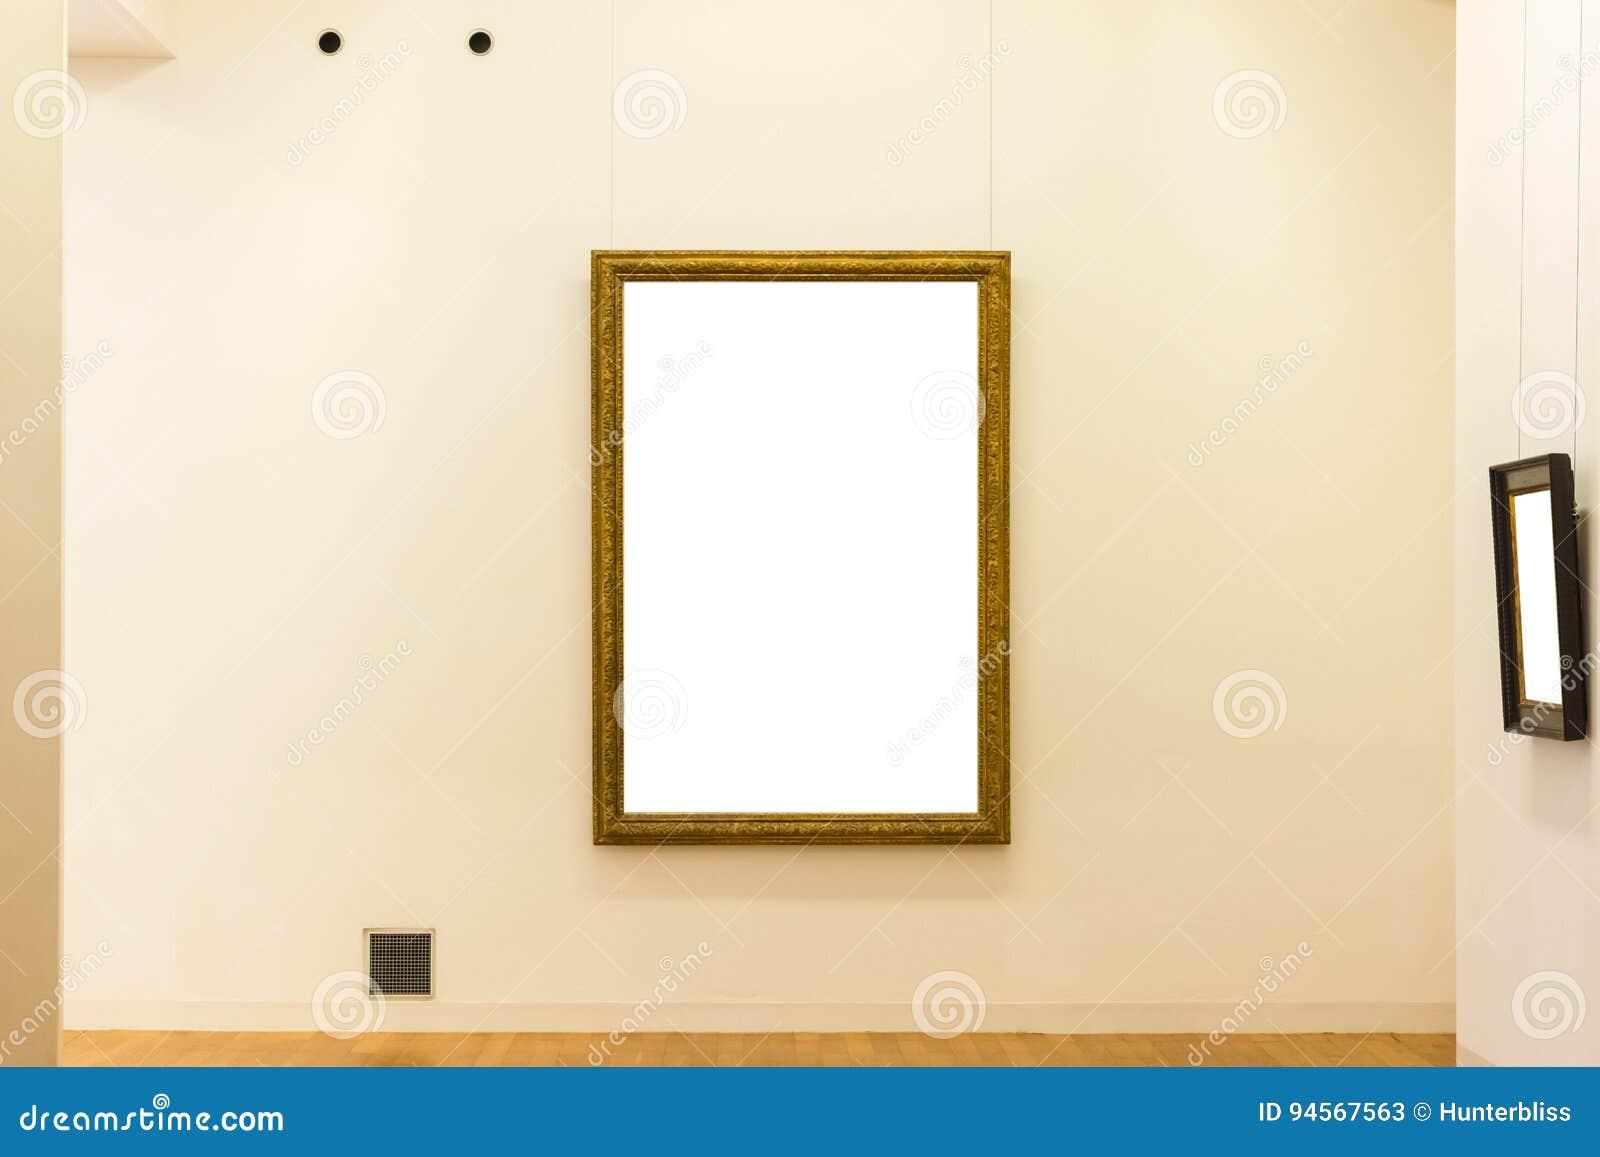 Lege Art Museum Isolated Painting Frame-Decoratie binnen Muur